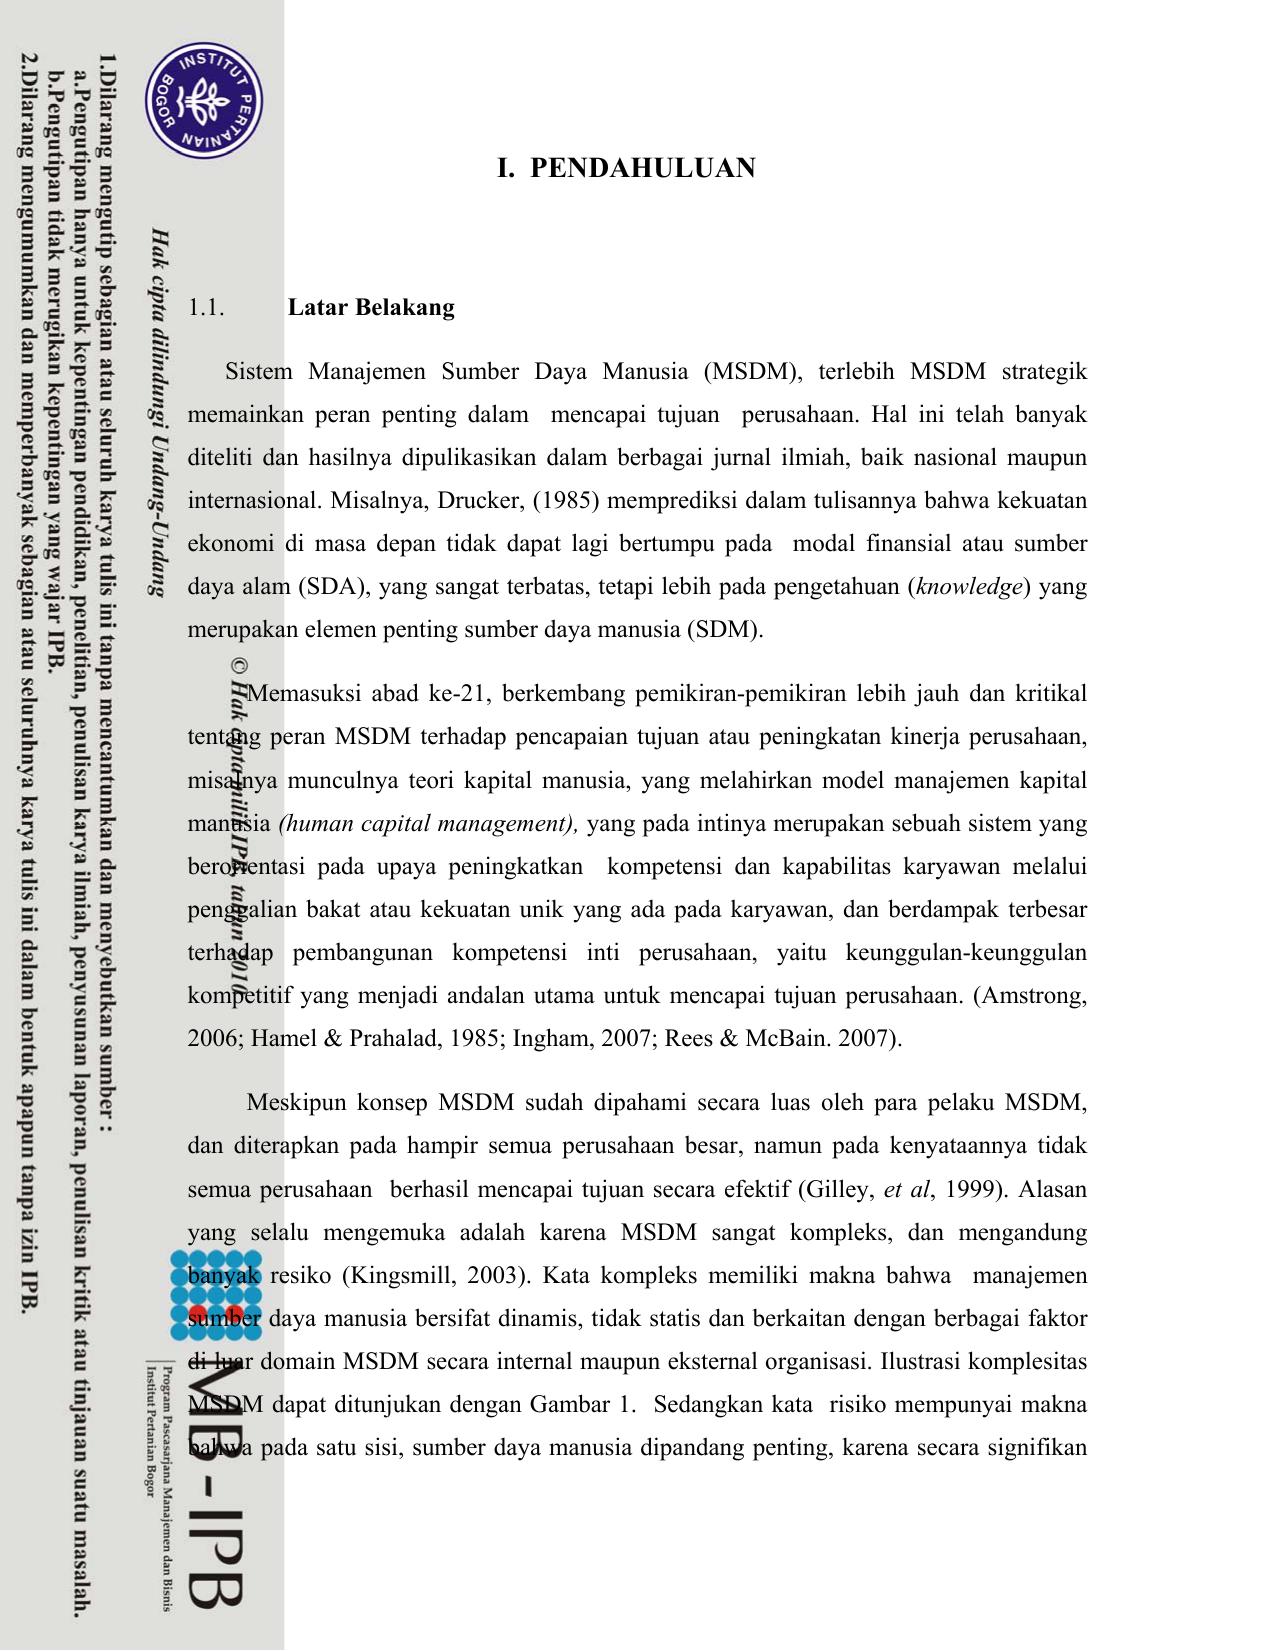 Jurnal Internasional Tentang Manajemen Sumber Daya Manusia لم يسبق